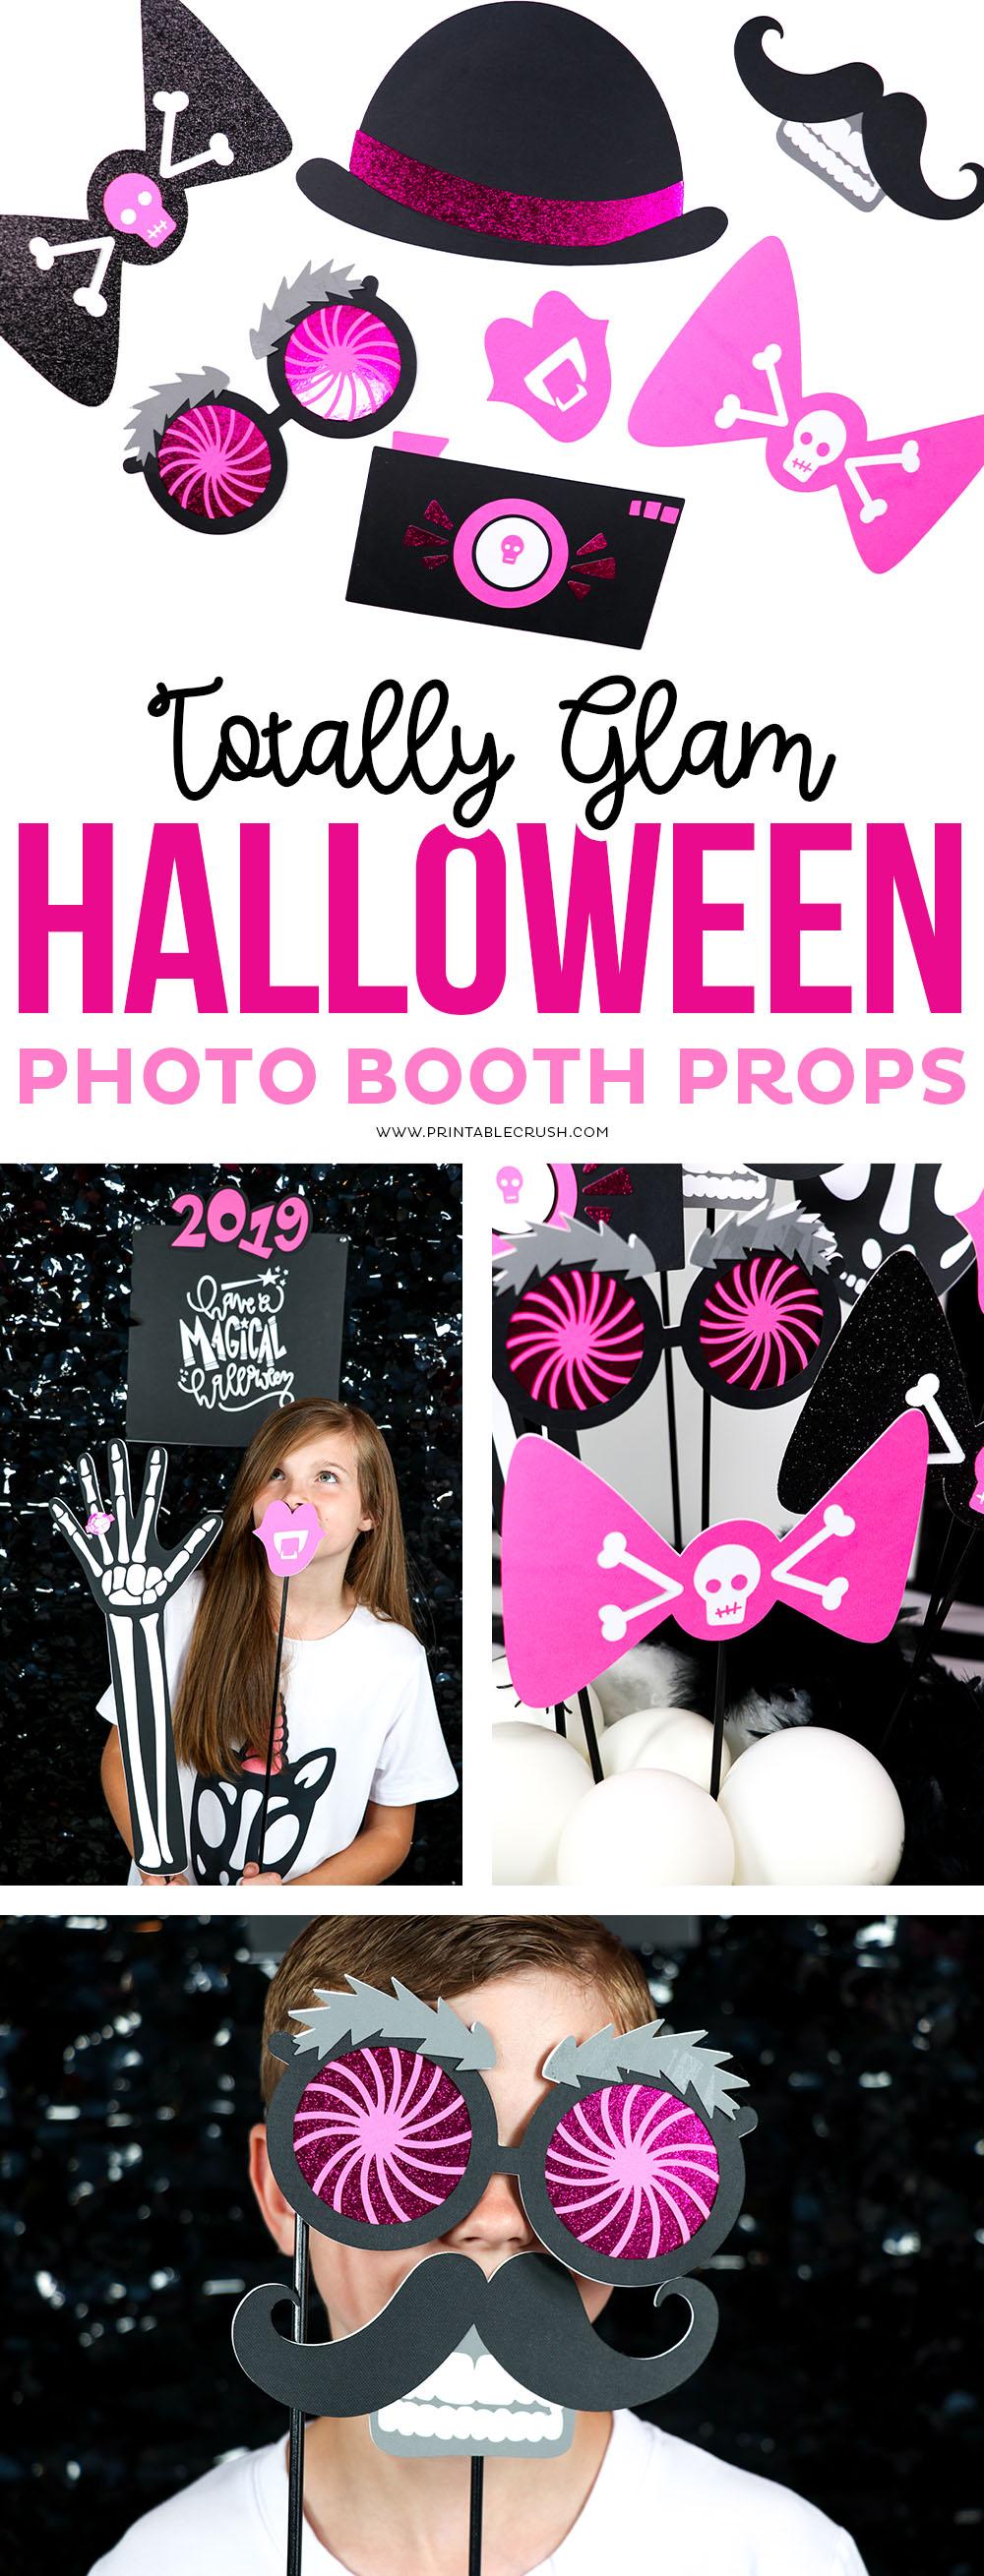 Halloween Photo Booth Prop The Vampire